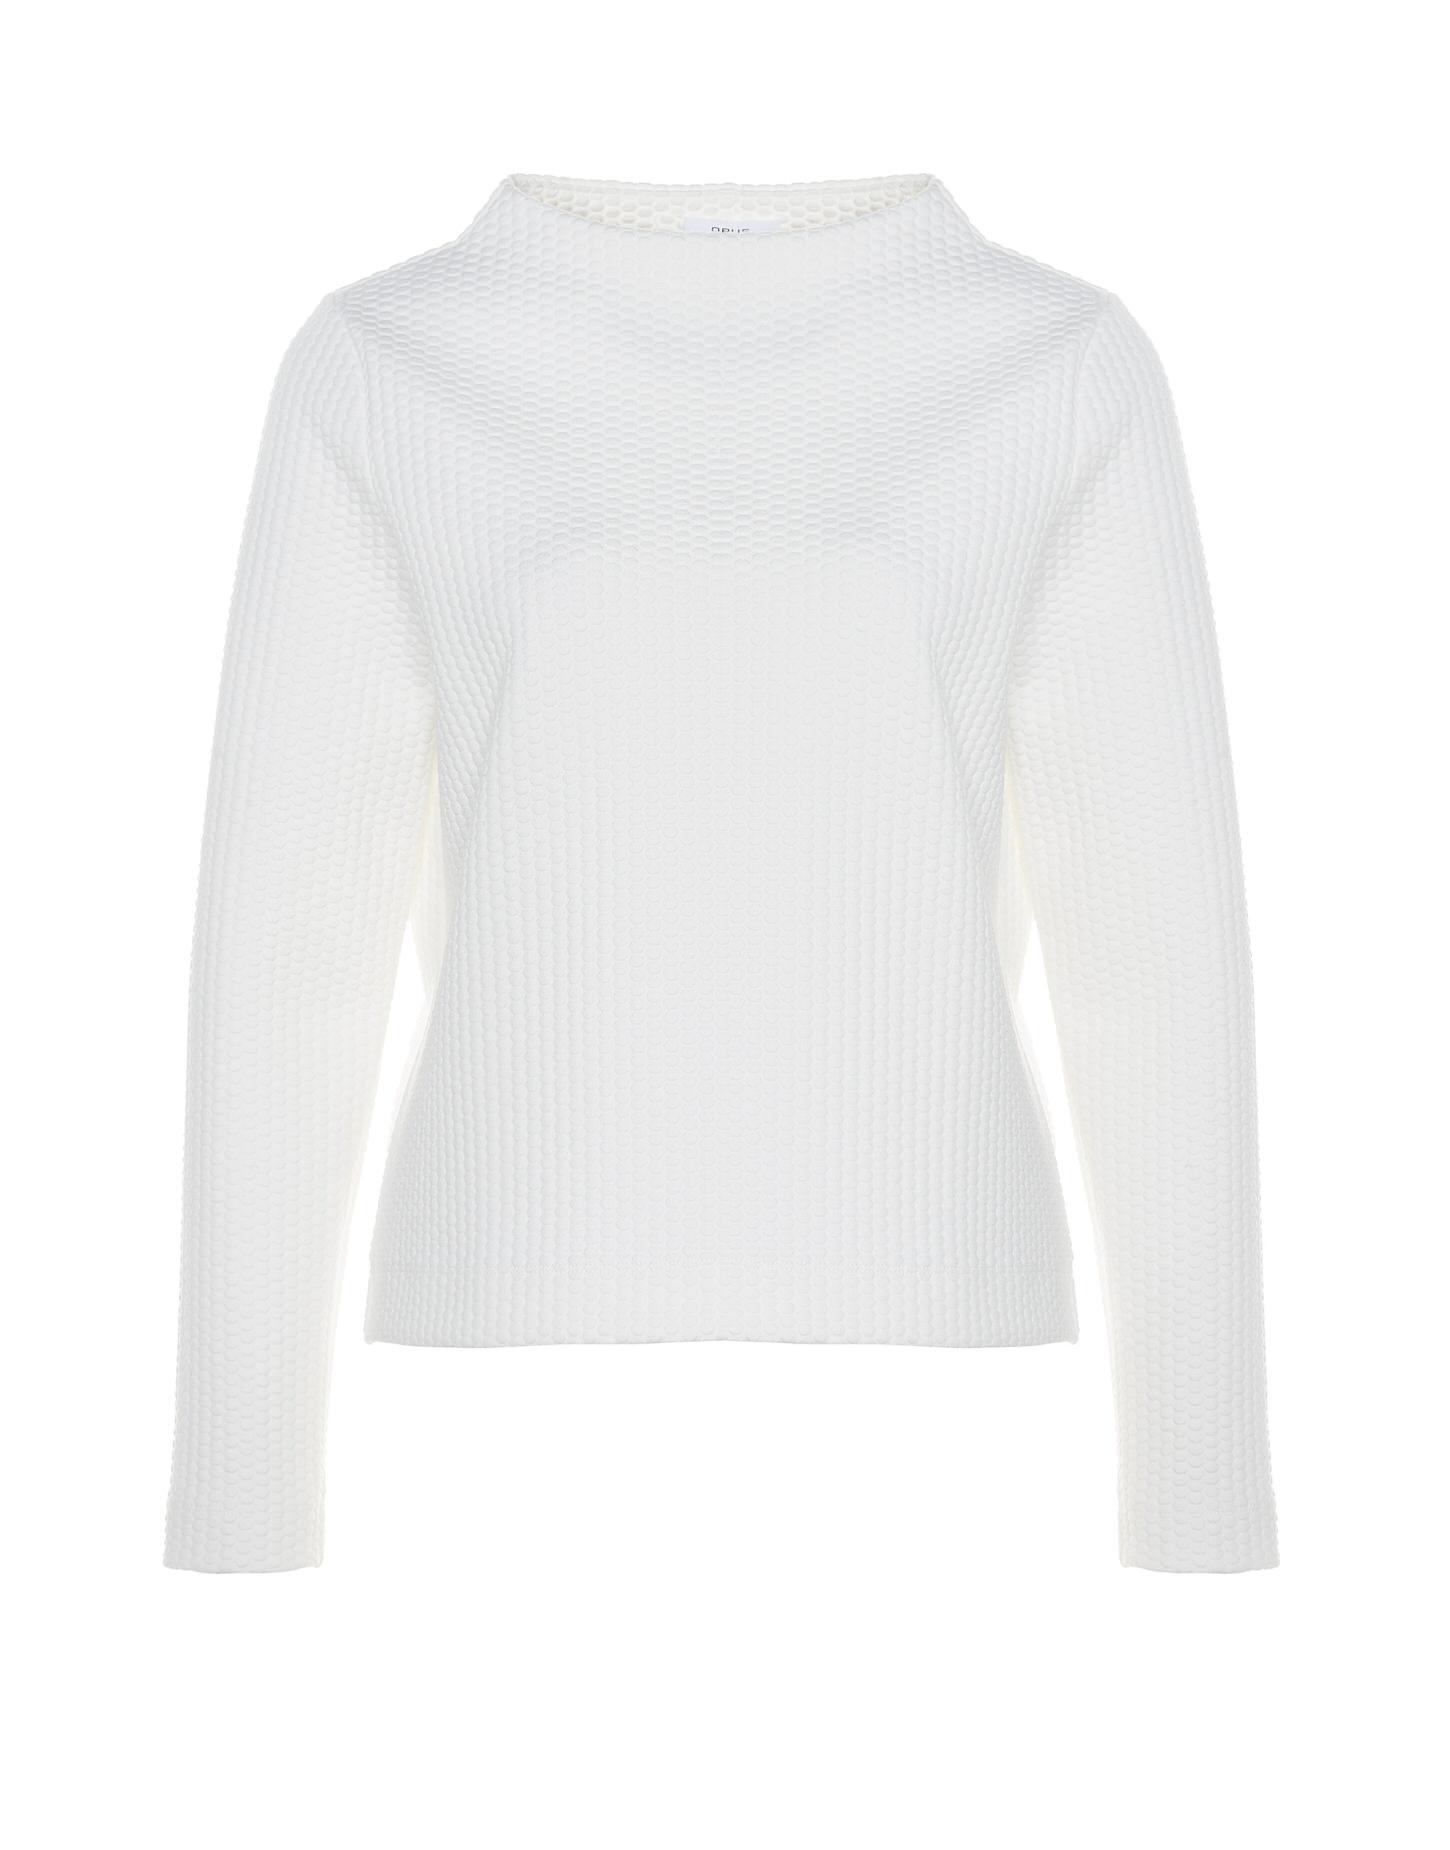 Witte dames trui Opus - Galvana 233734968